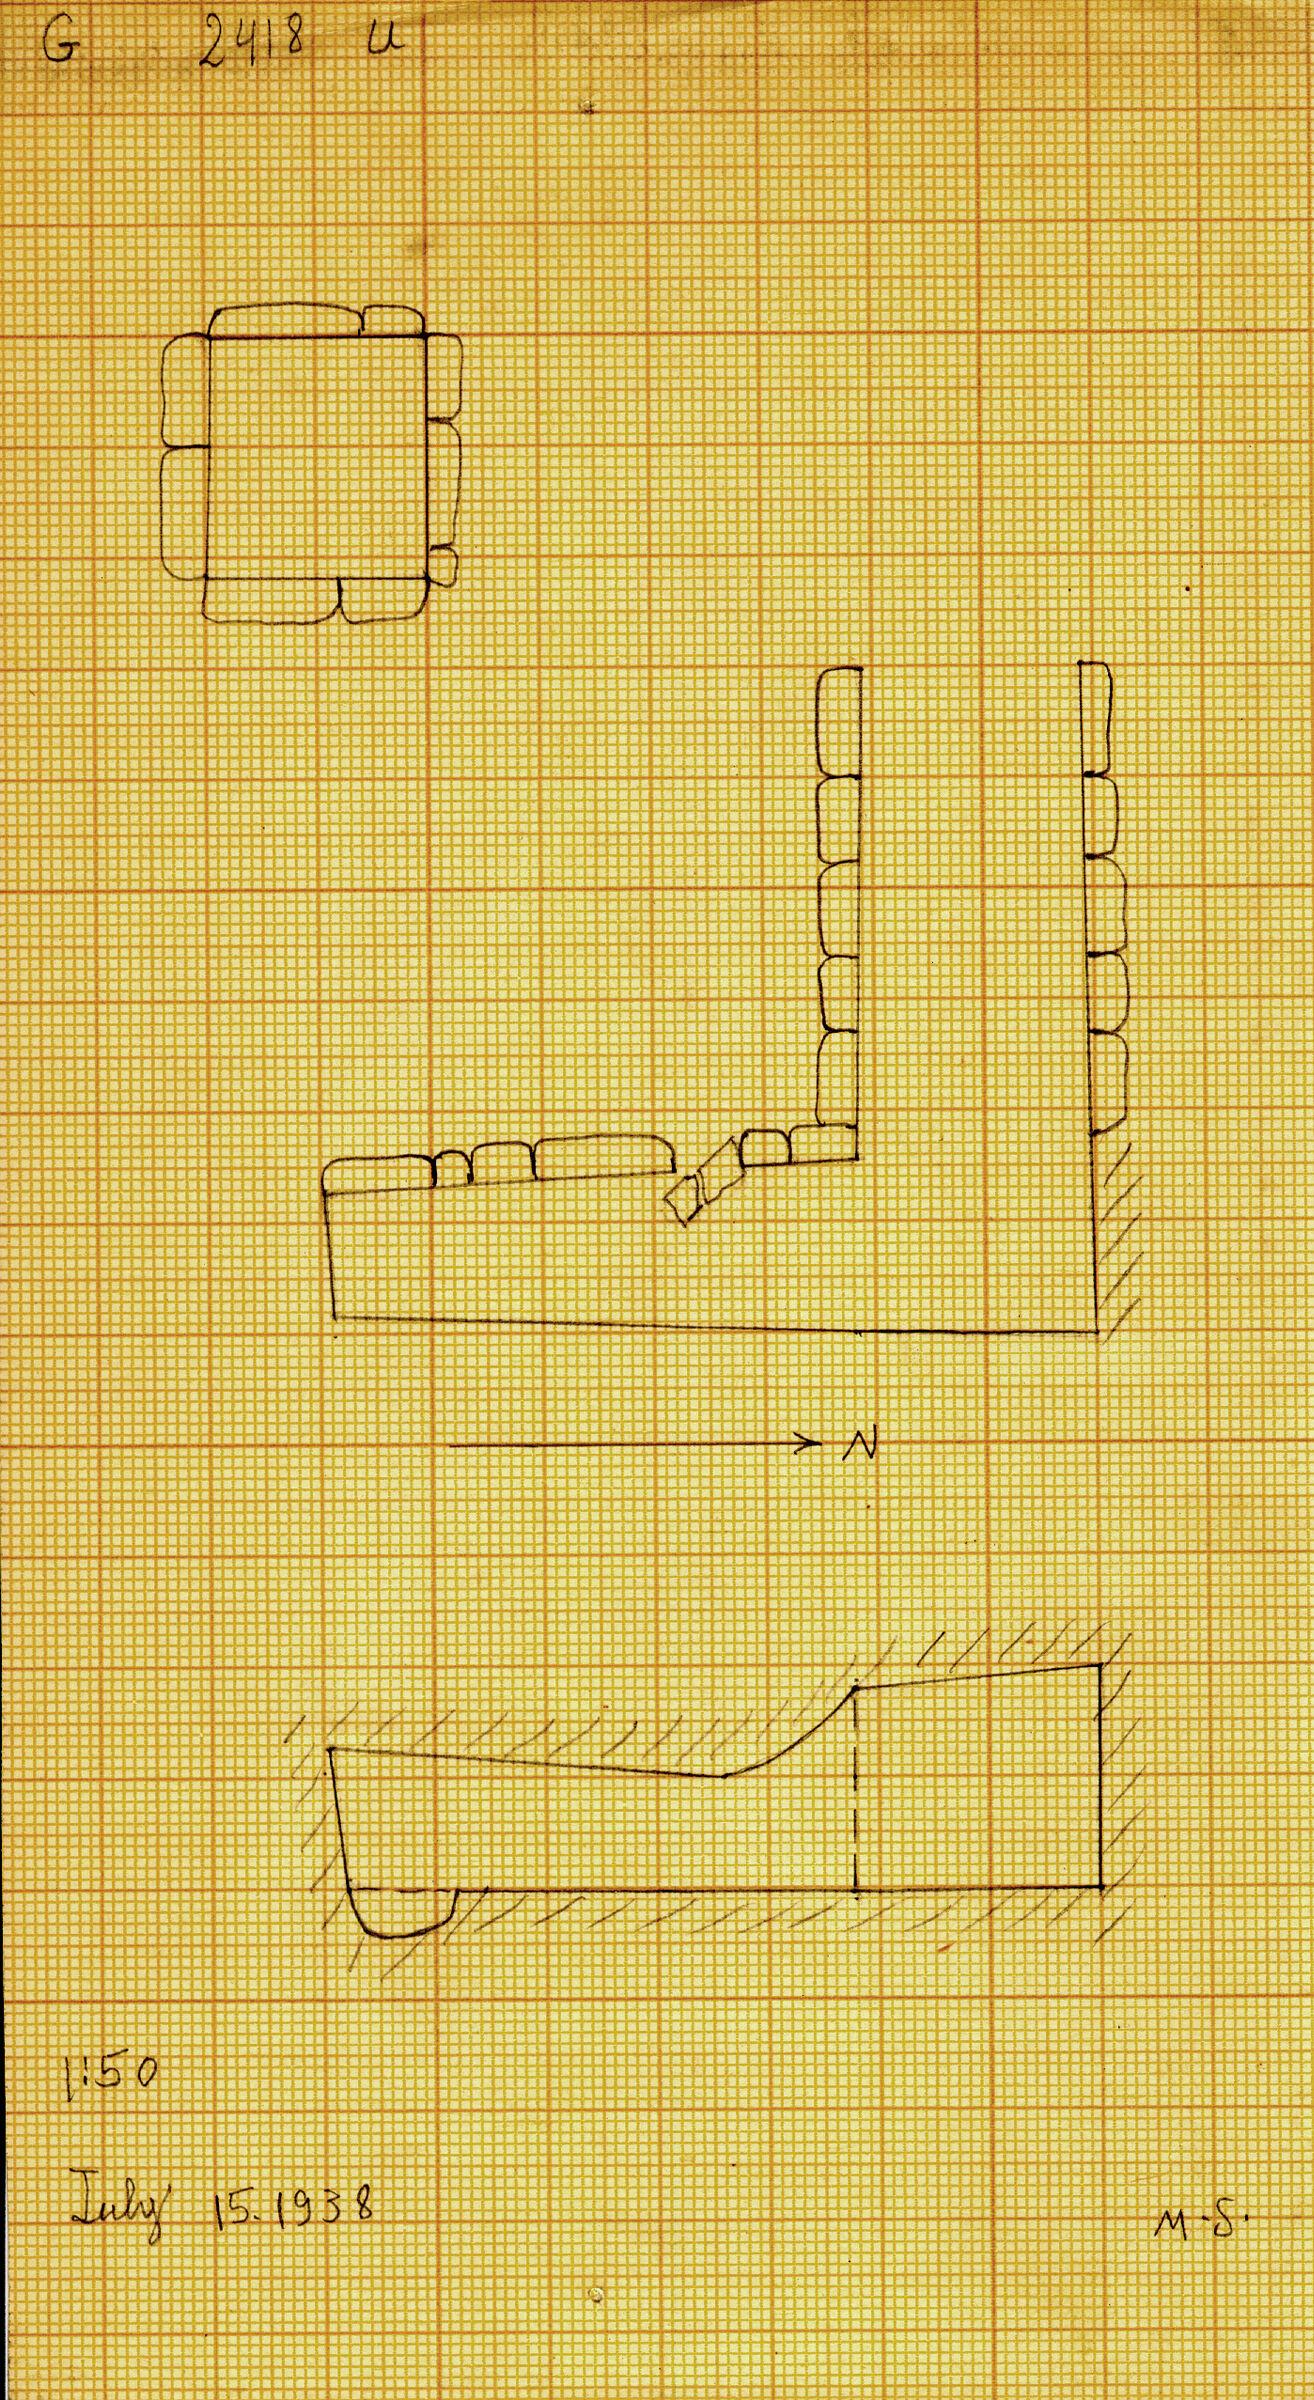 Maps and plans: G 2418, Shaft U